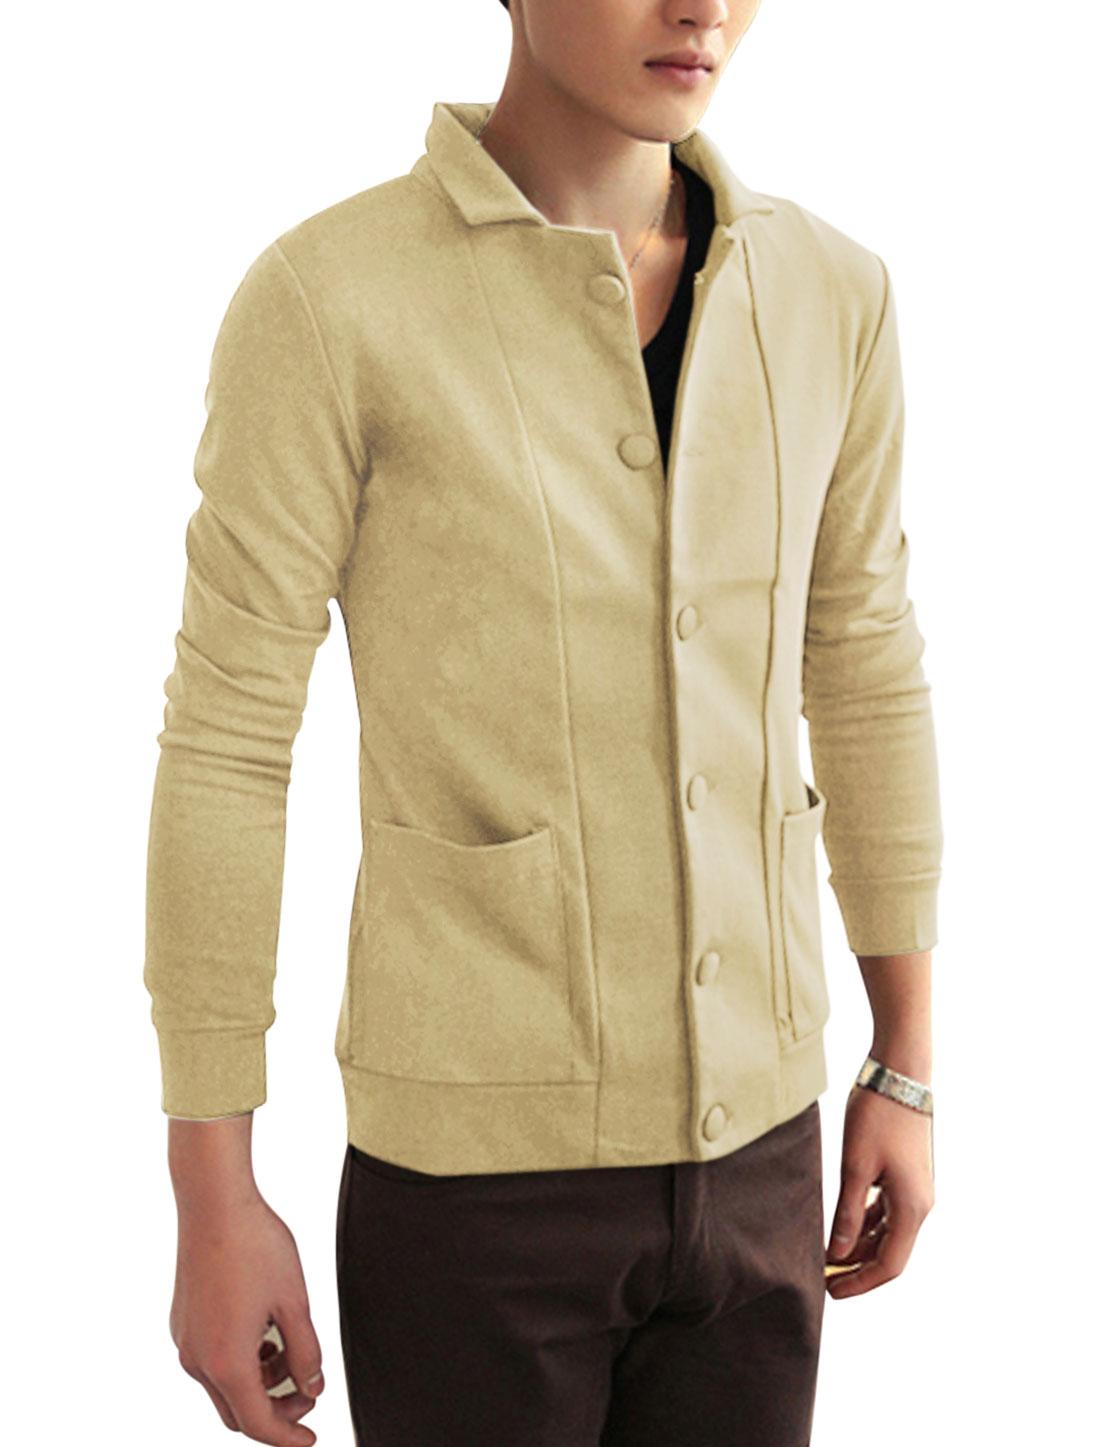 Men Long Sleeve Single Breasted Leisure Jacket Beige M